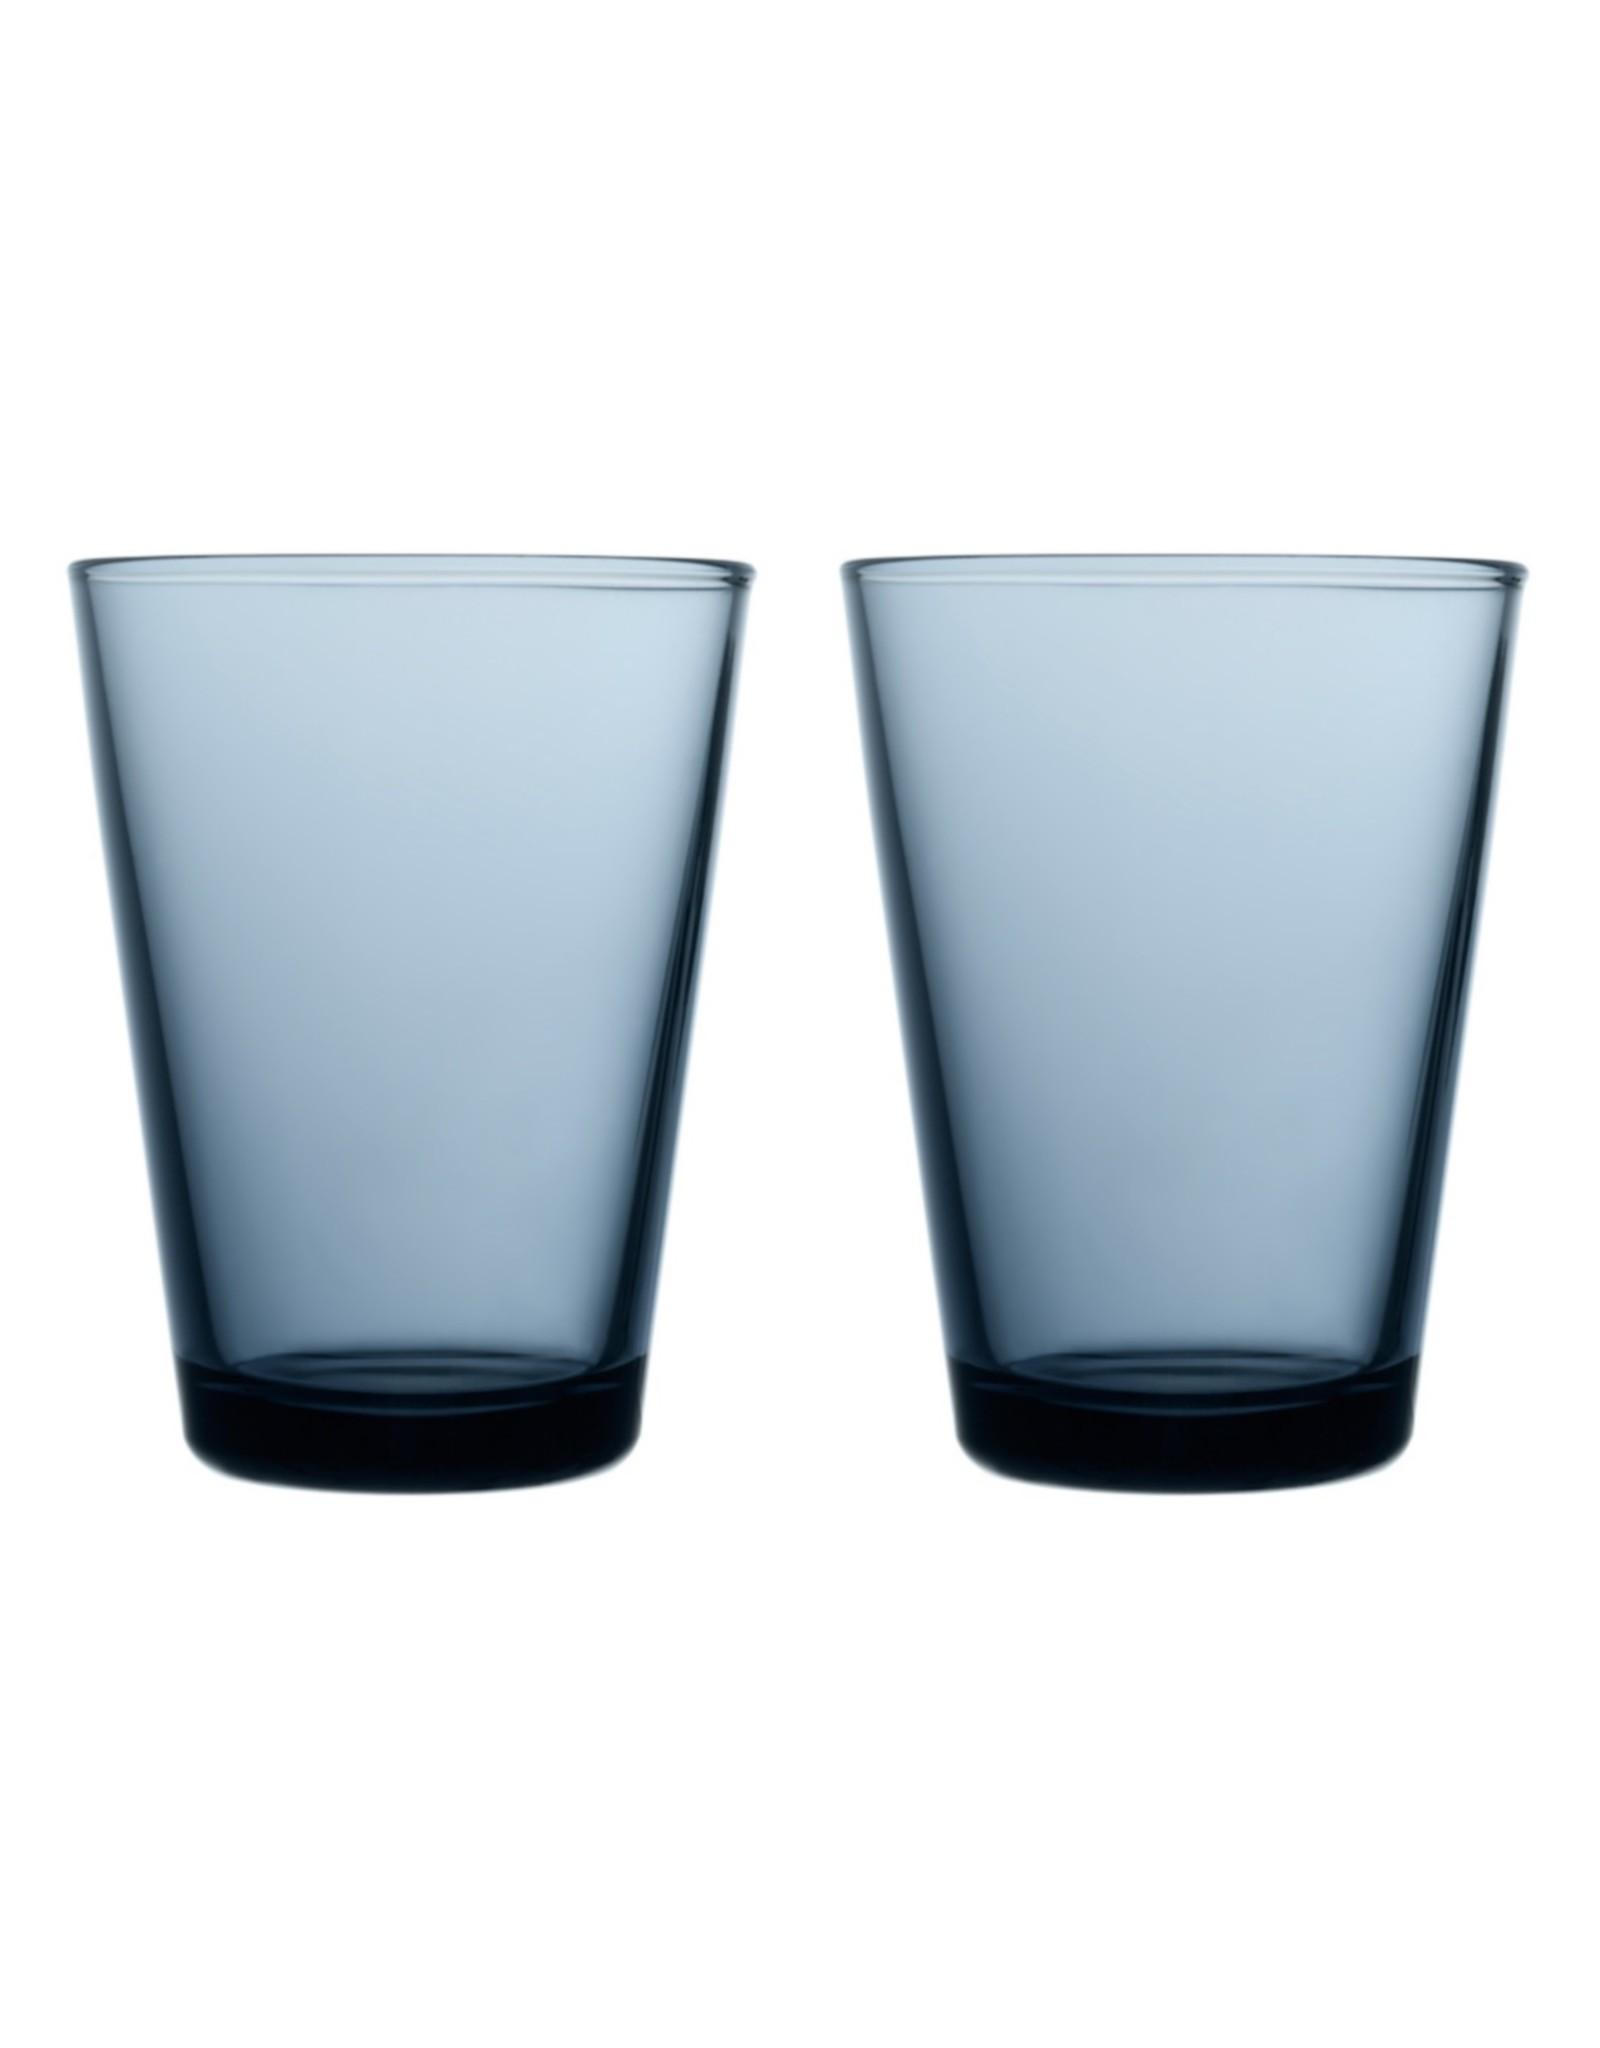 Iittala Iittala Kartio - Glas - 40 cl - Regenblauw - 2 stuks